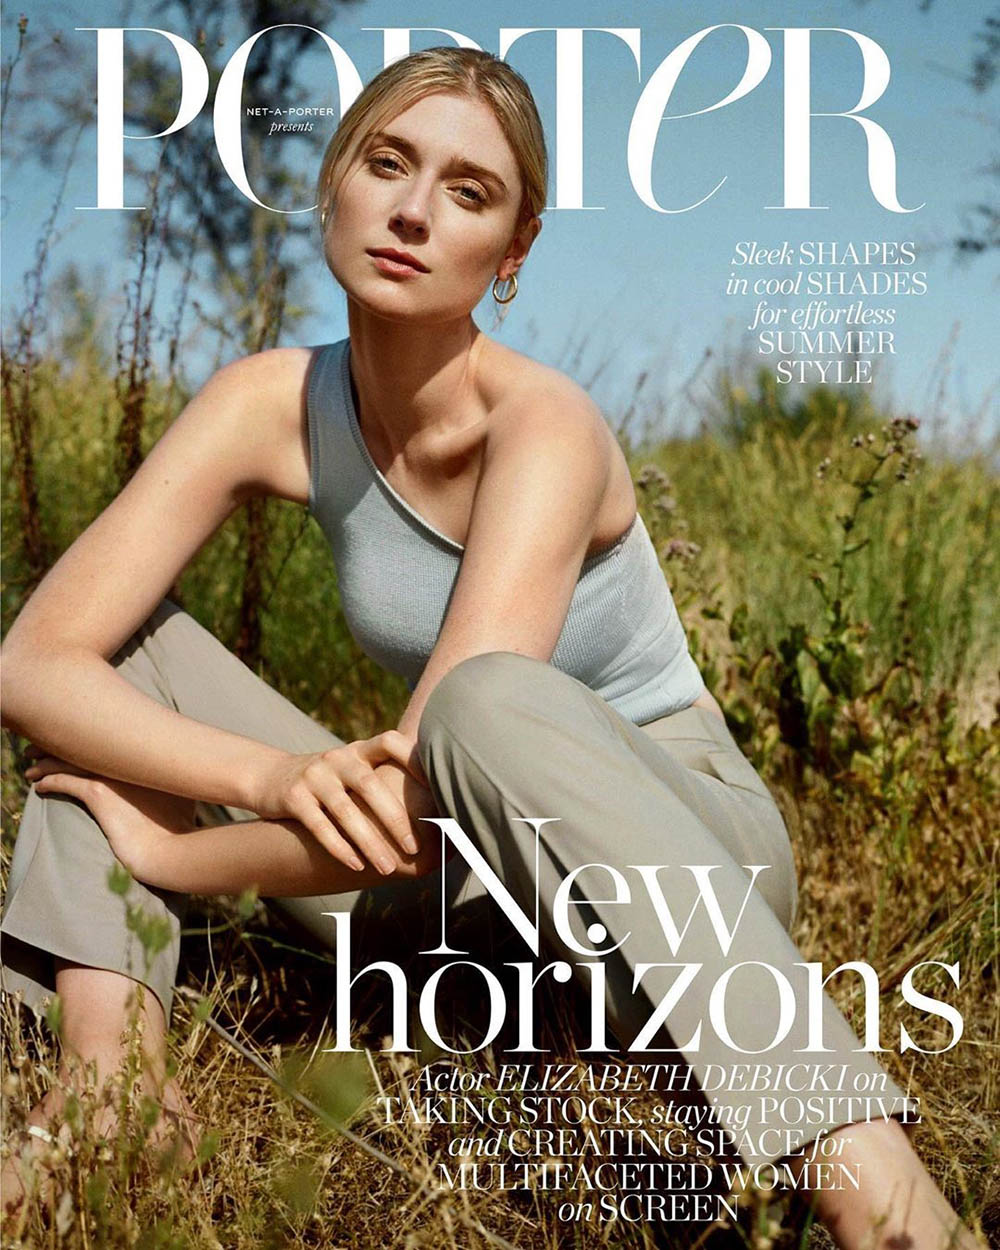 Elizabeth Debicki covers Porter Magazine July 13th, 2020 by Olivia Malone